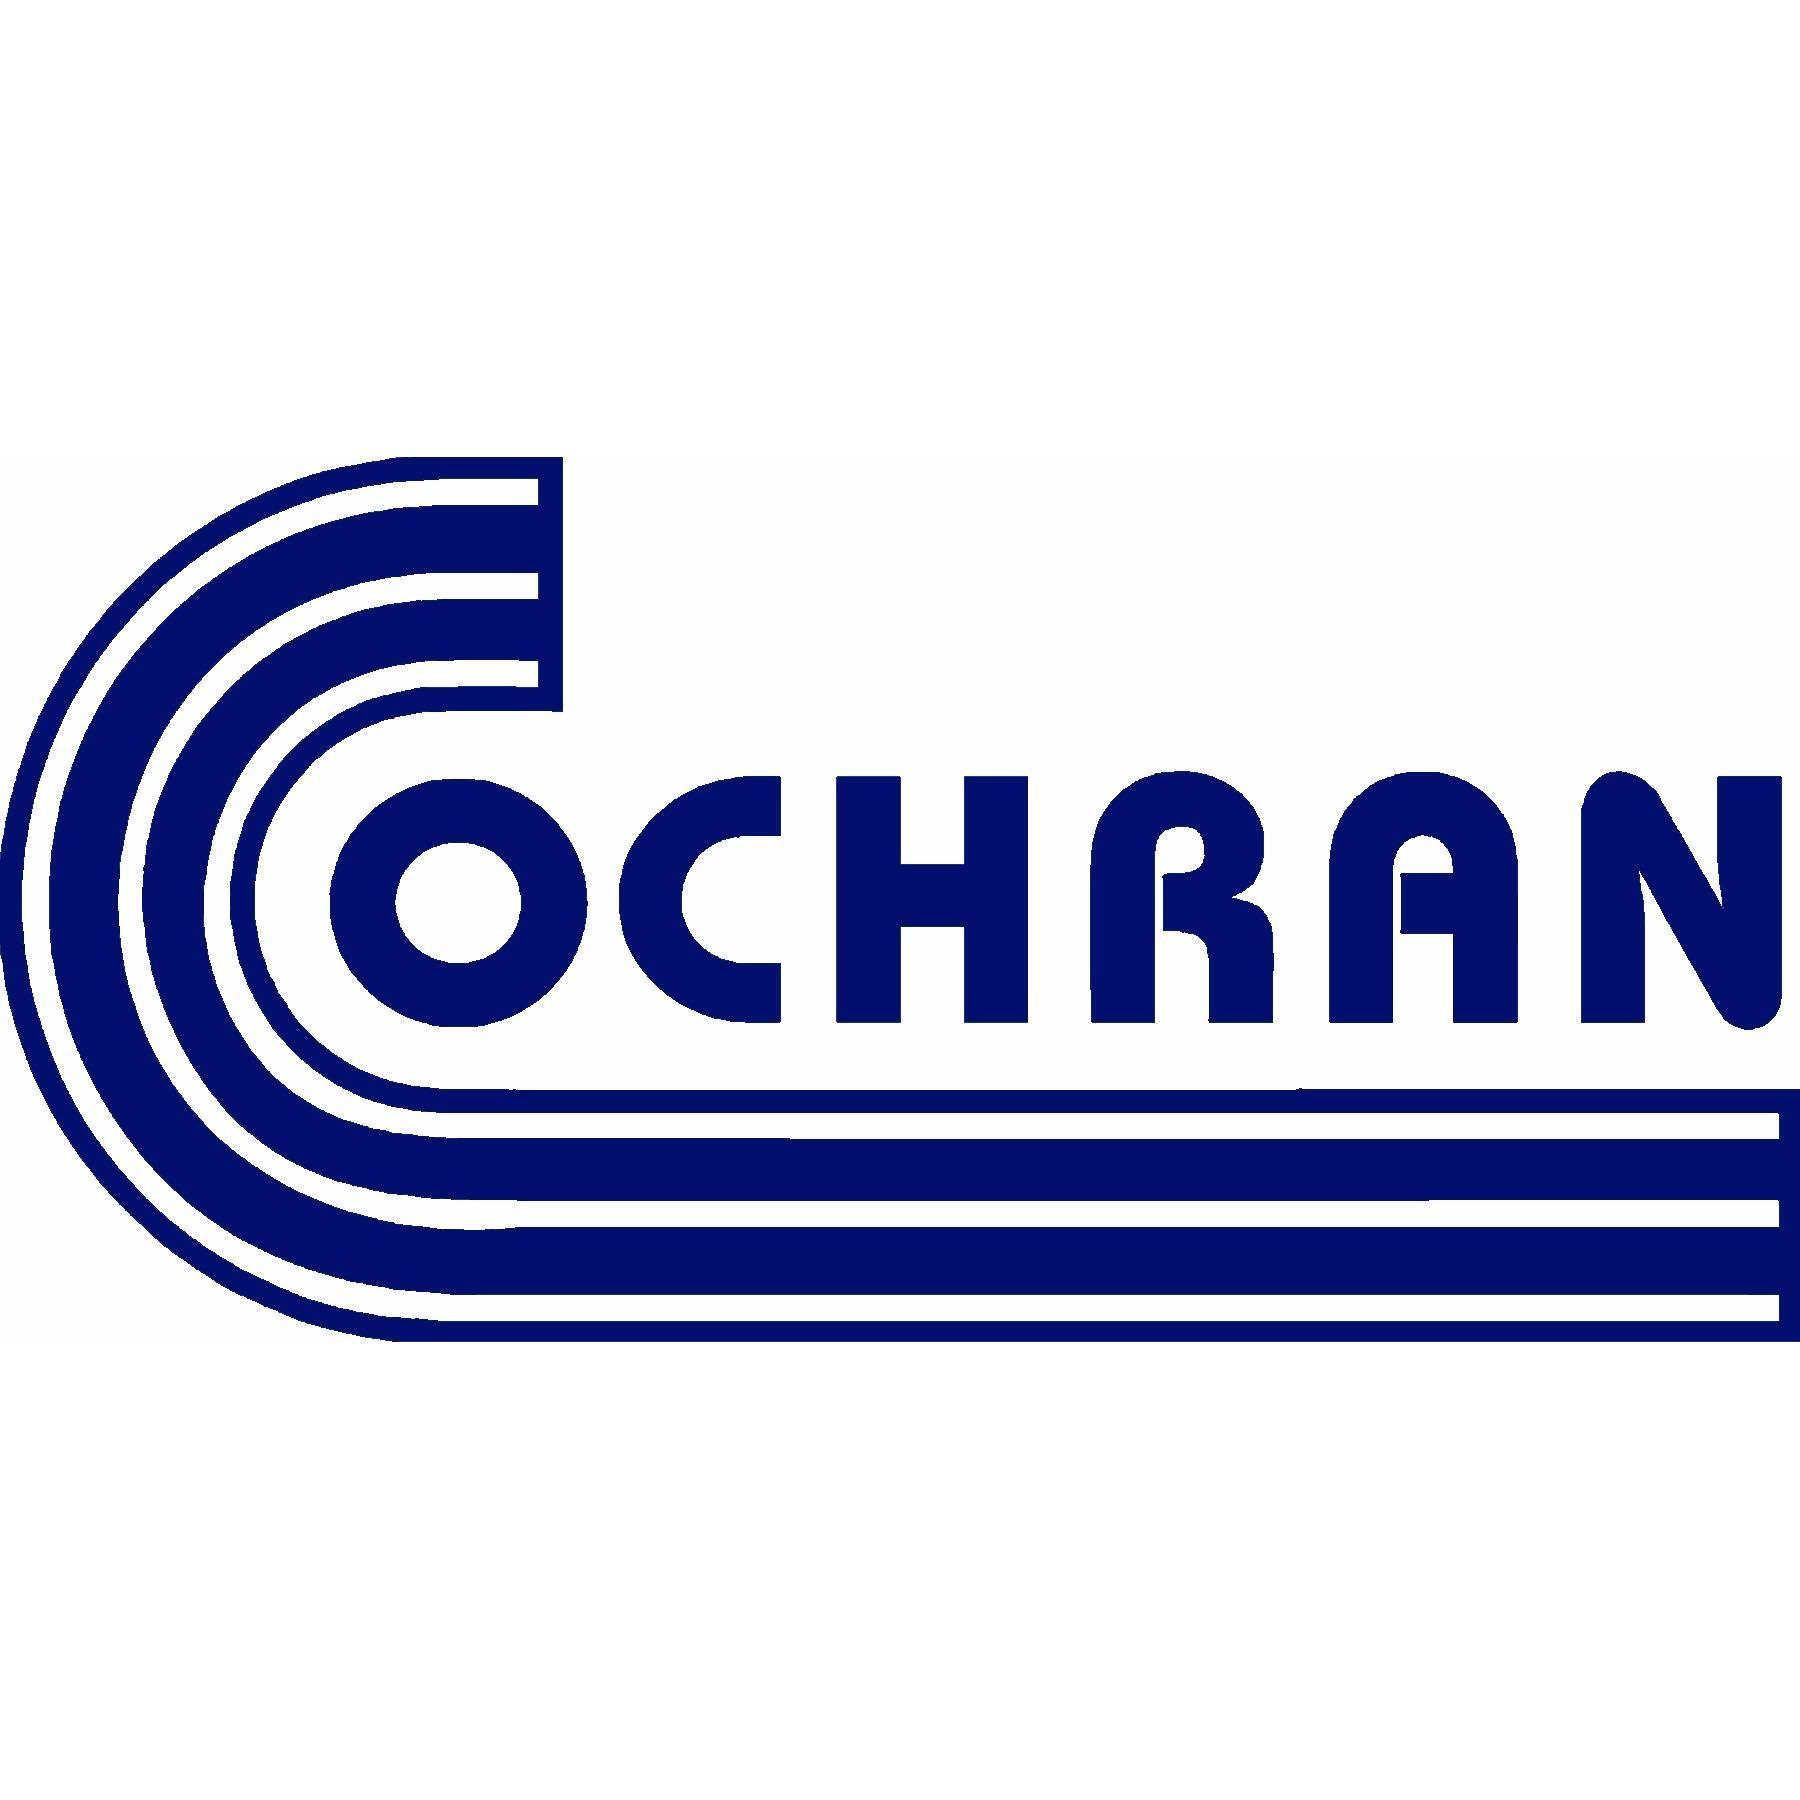 Cochran